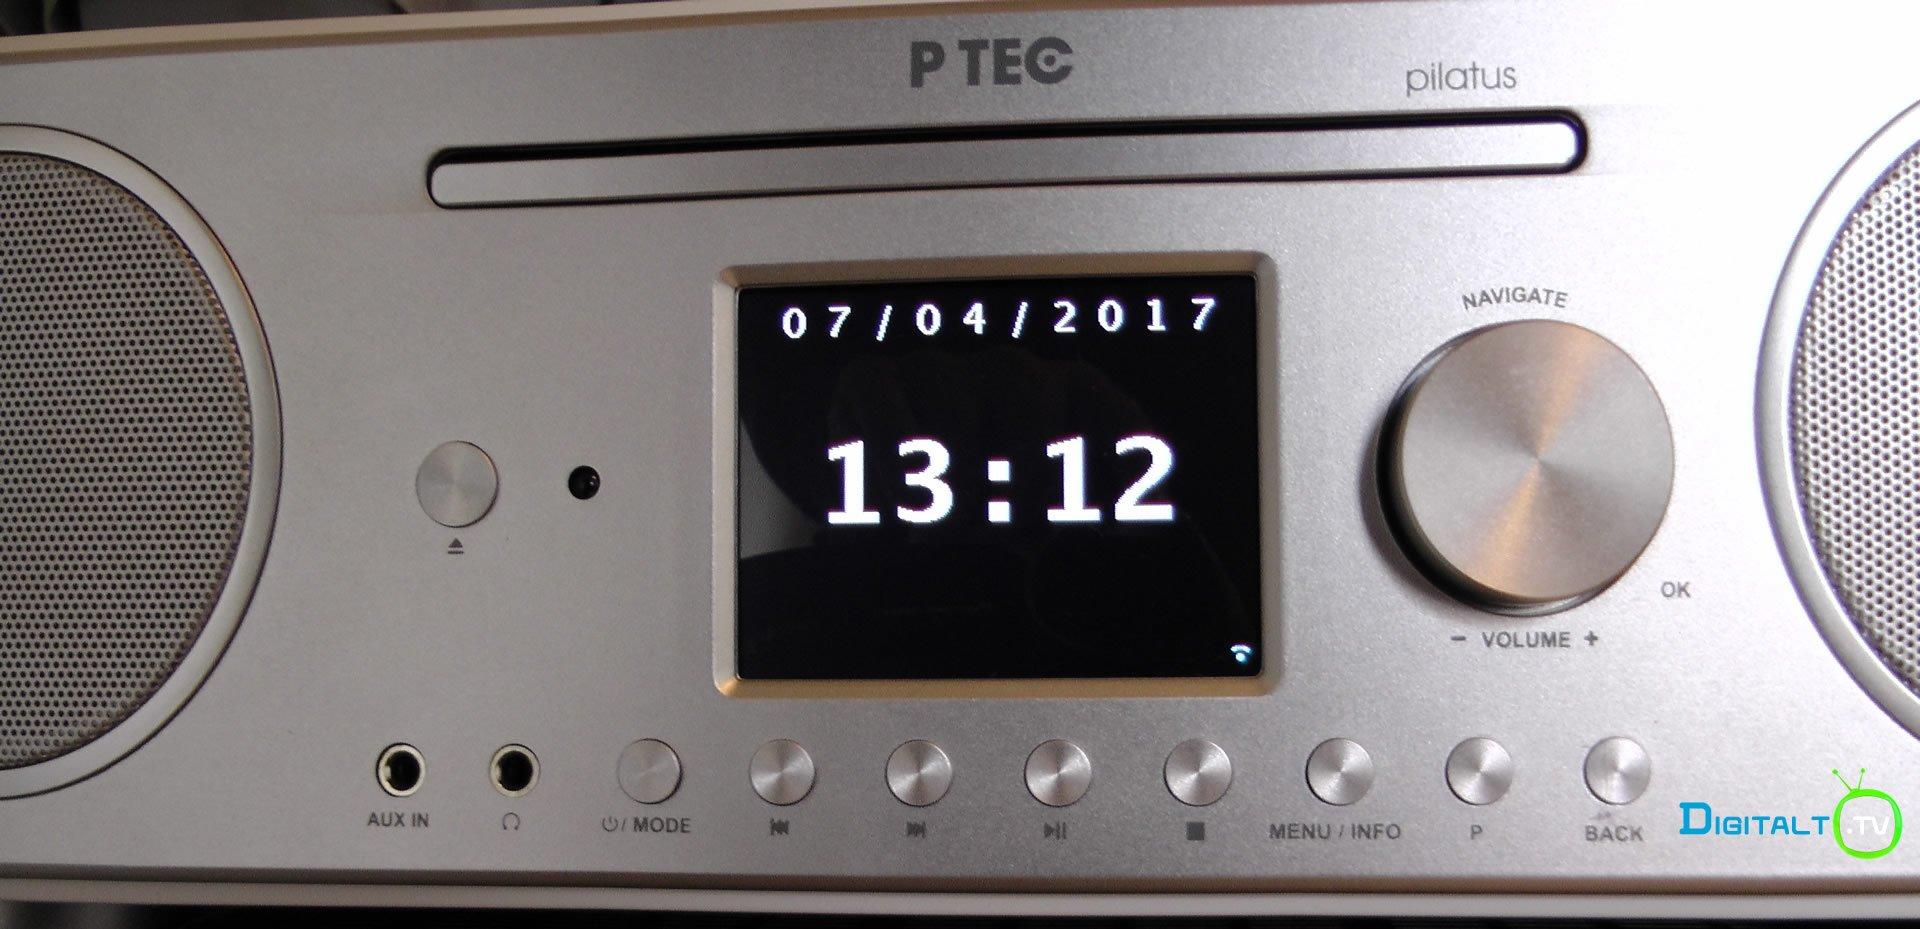 Pilatus front display ur